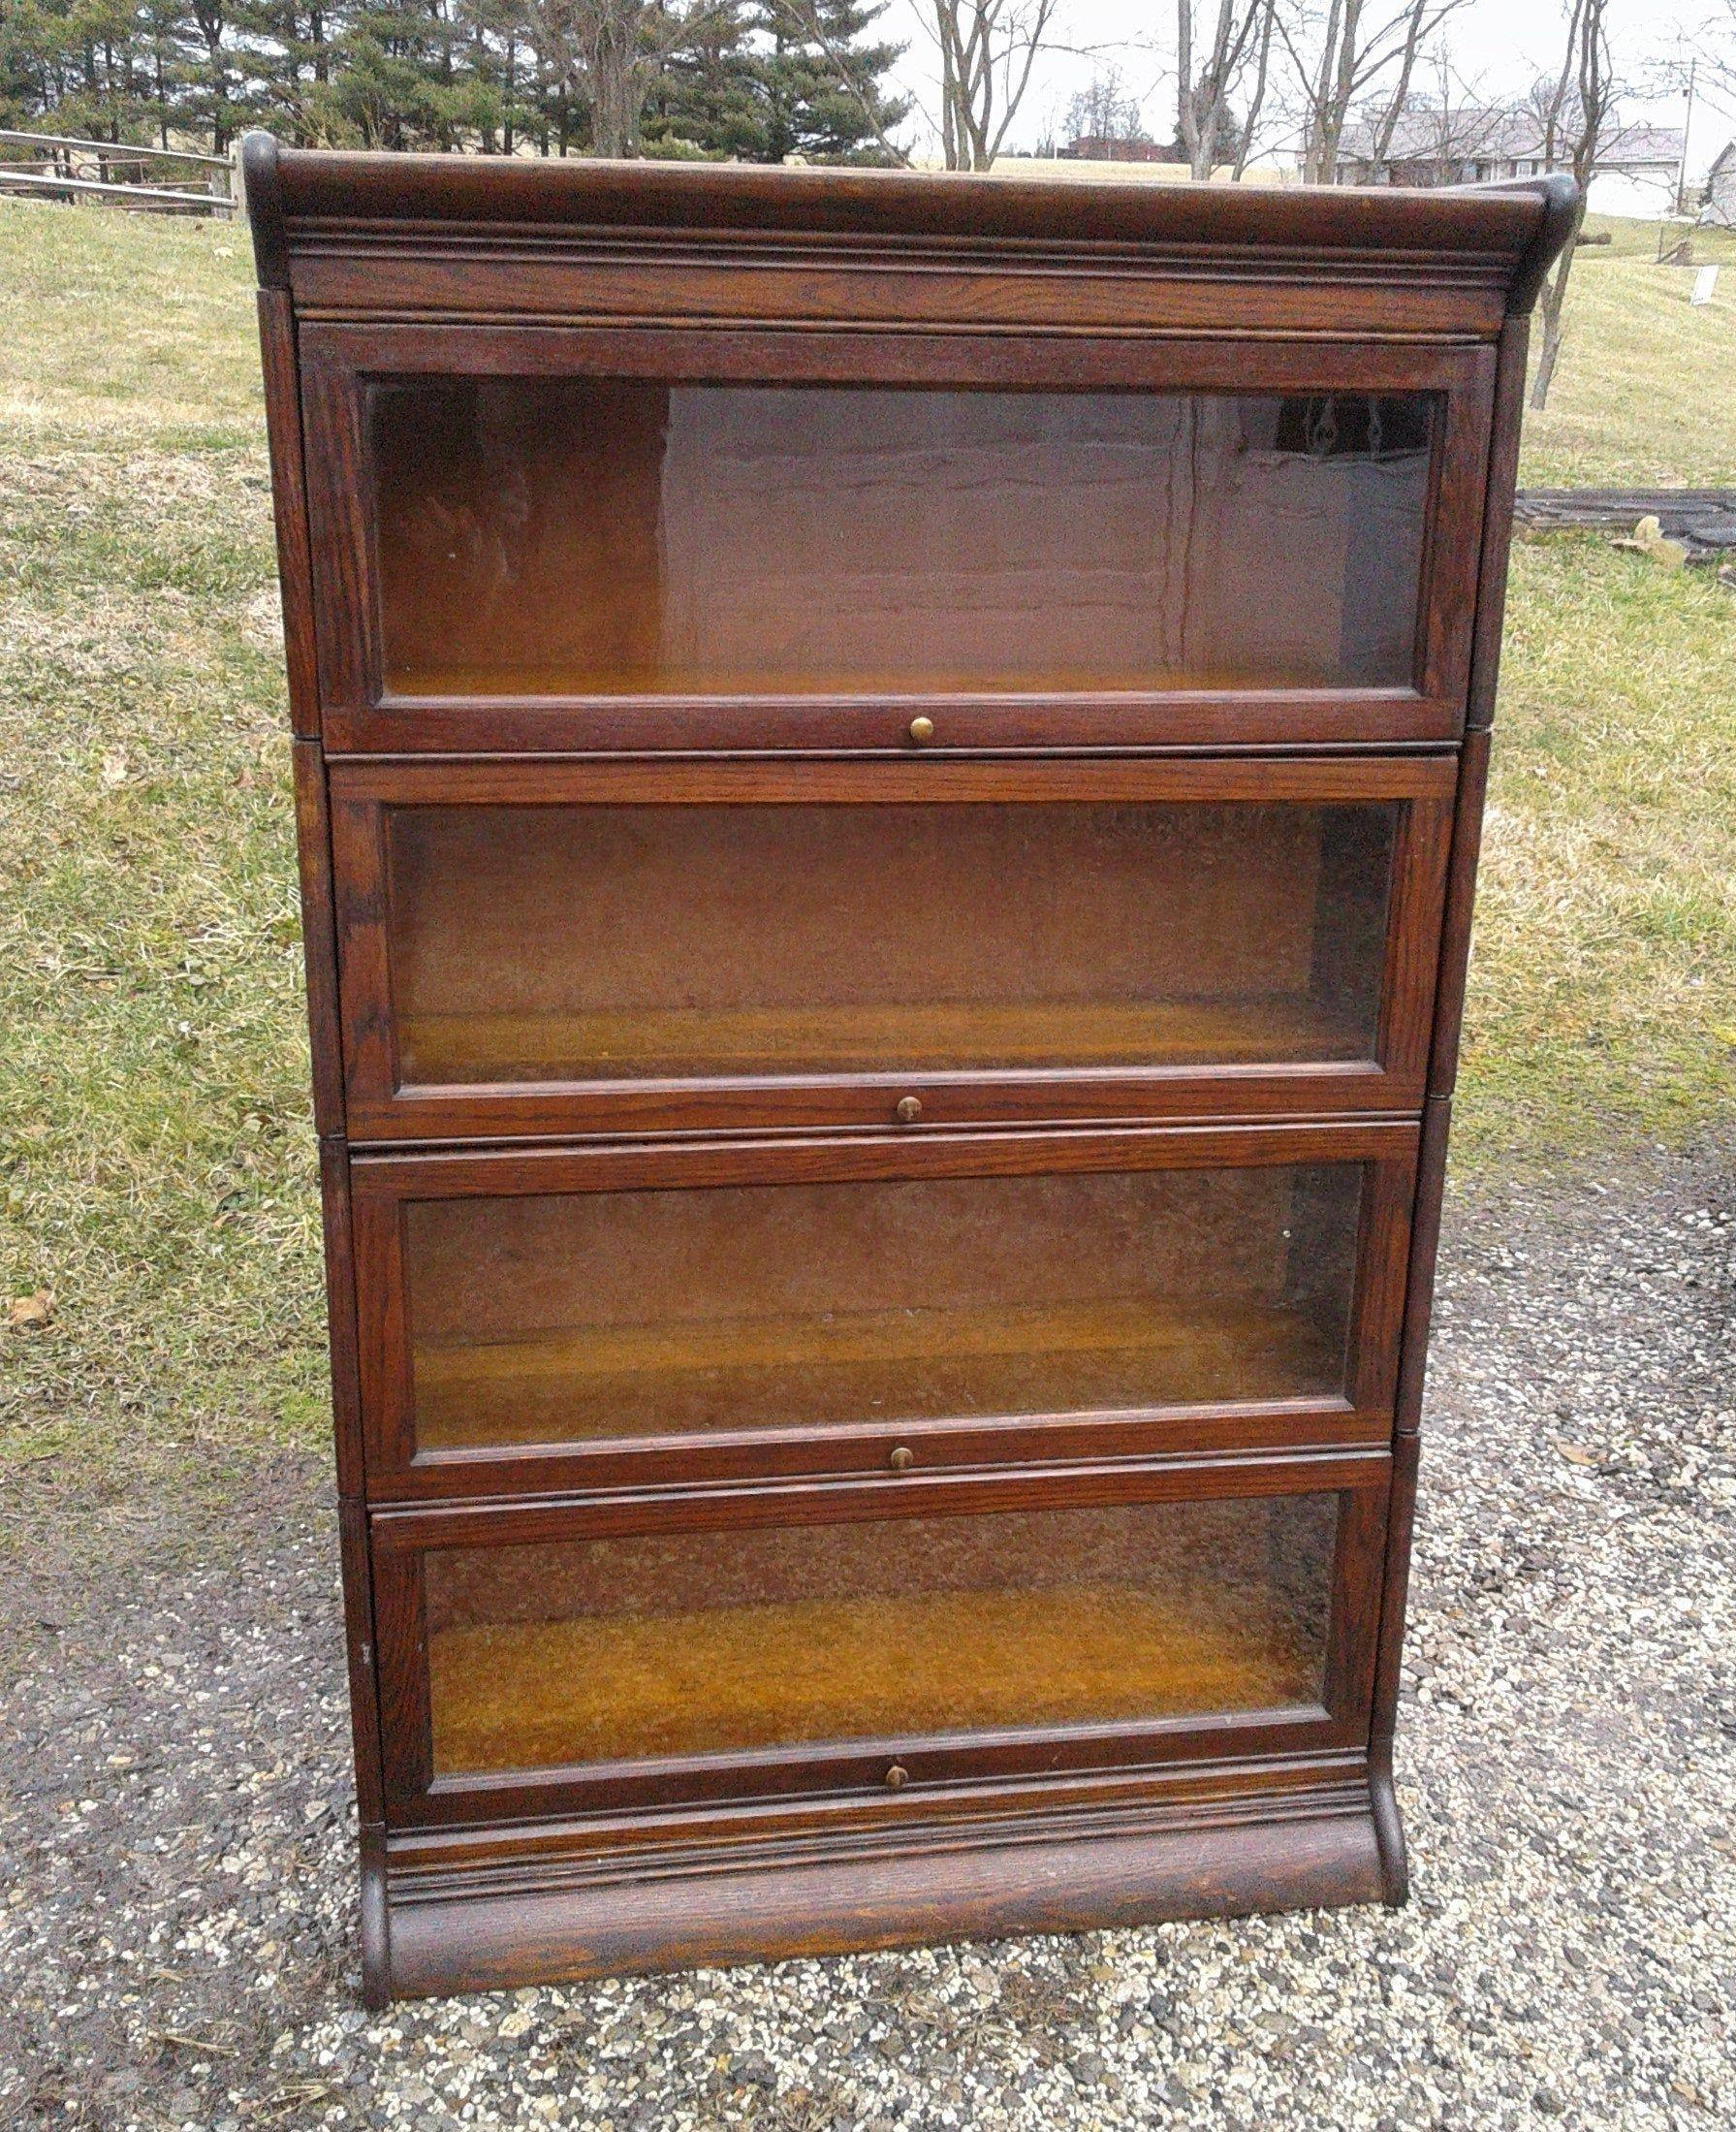 Antique Barrister Bookcase 4 Stack Gunn Tiger Oak W Bull Nose